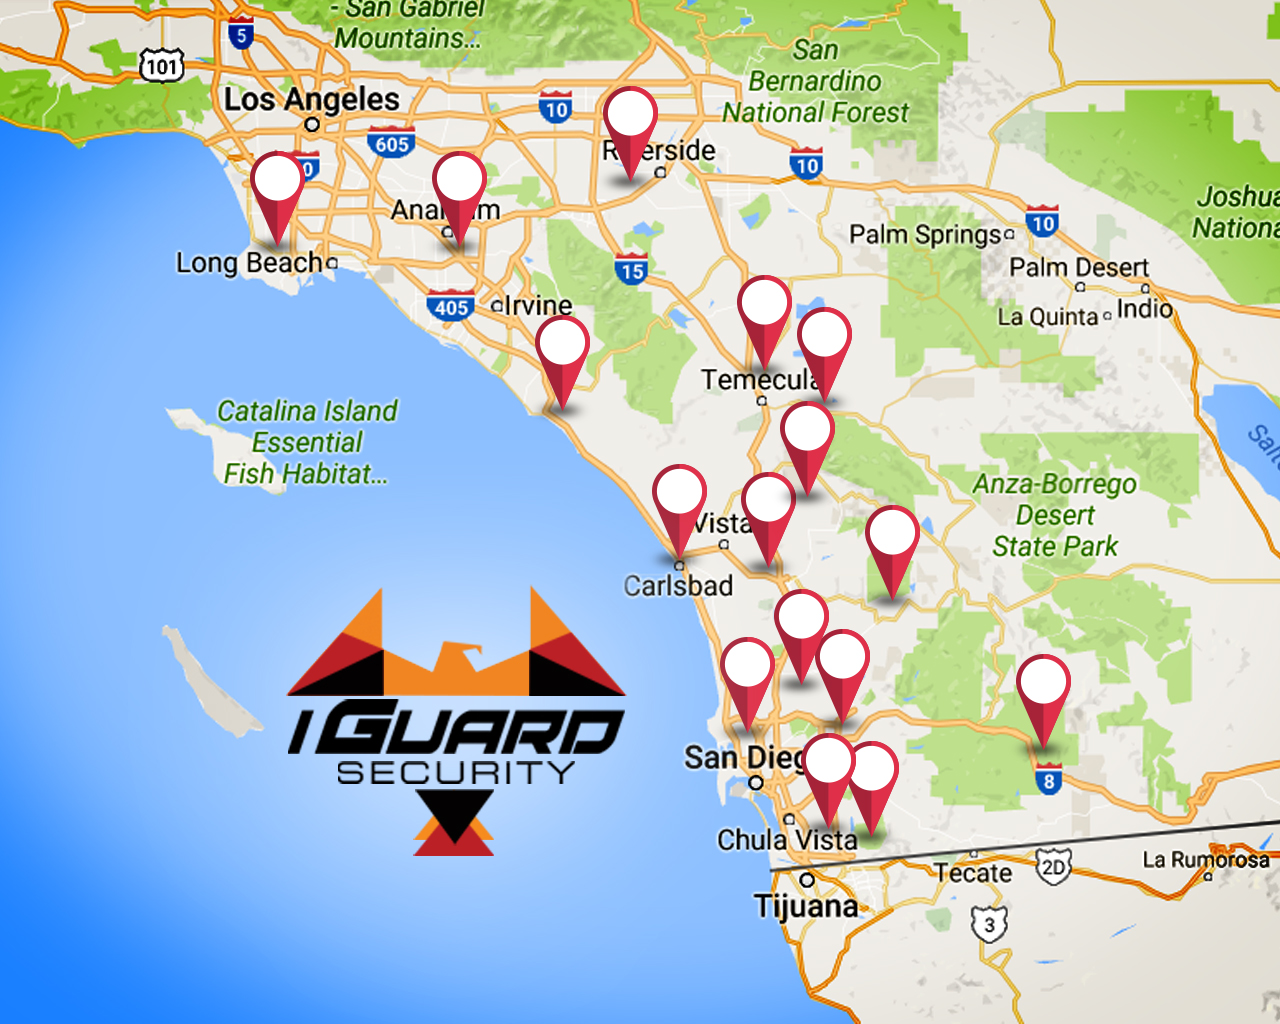 Iguard locations